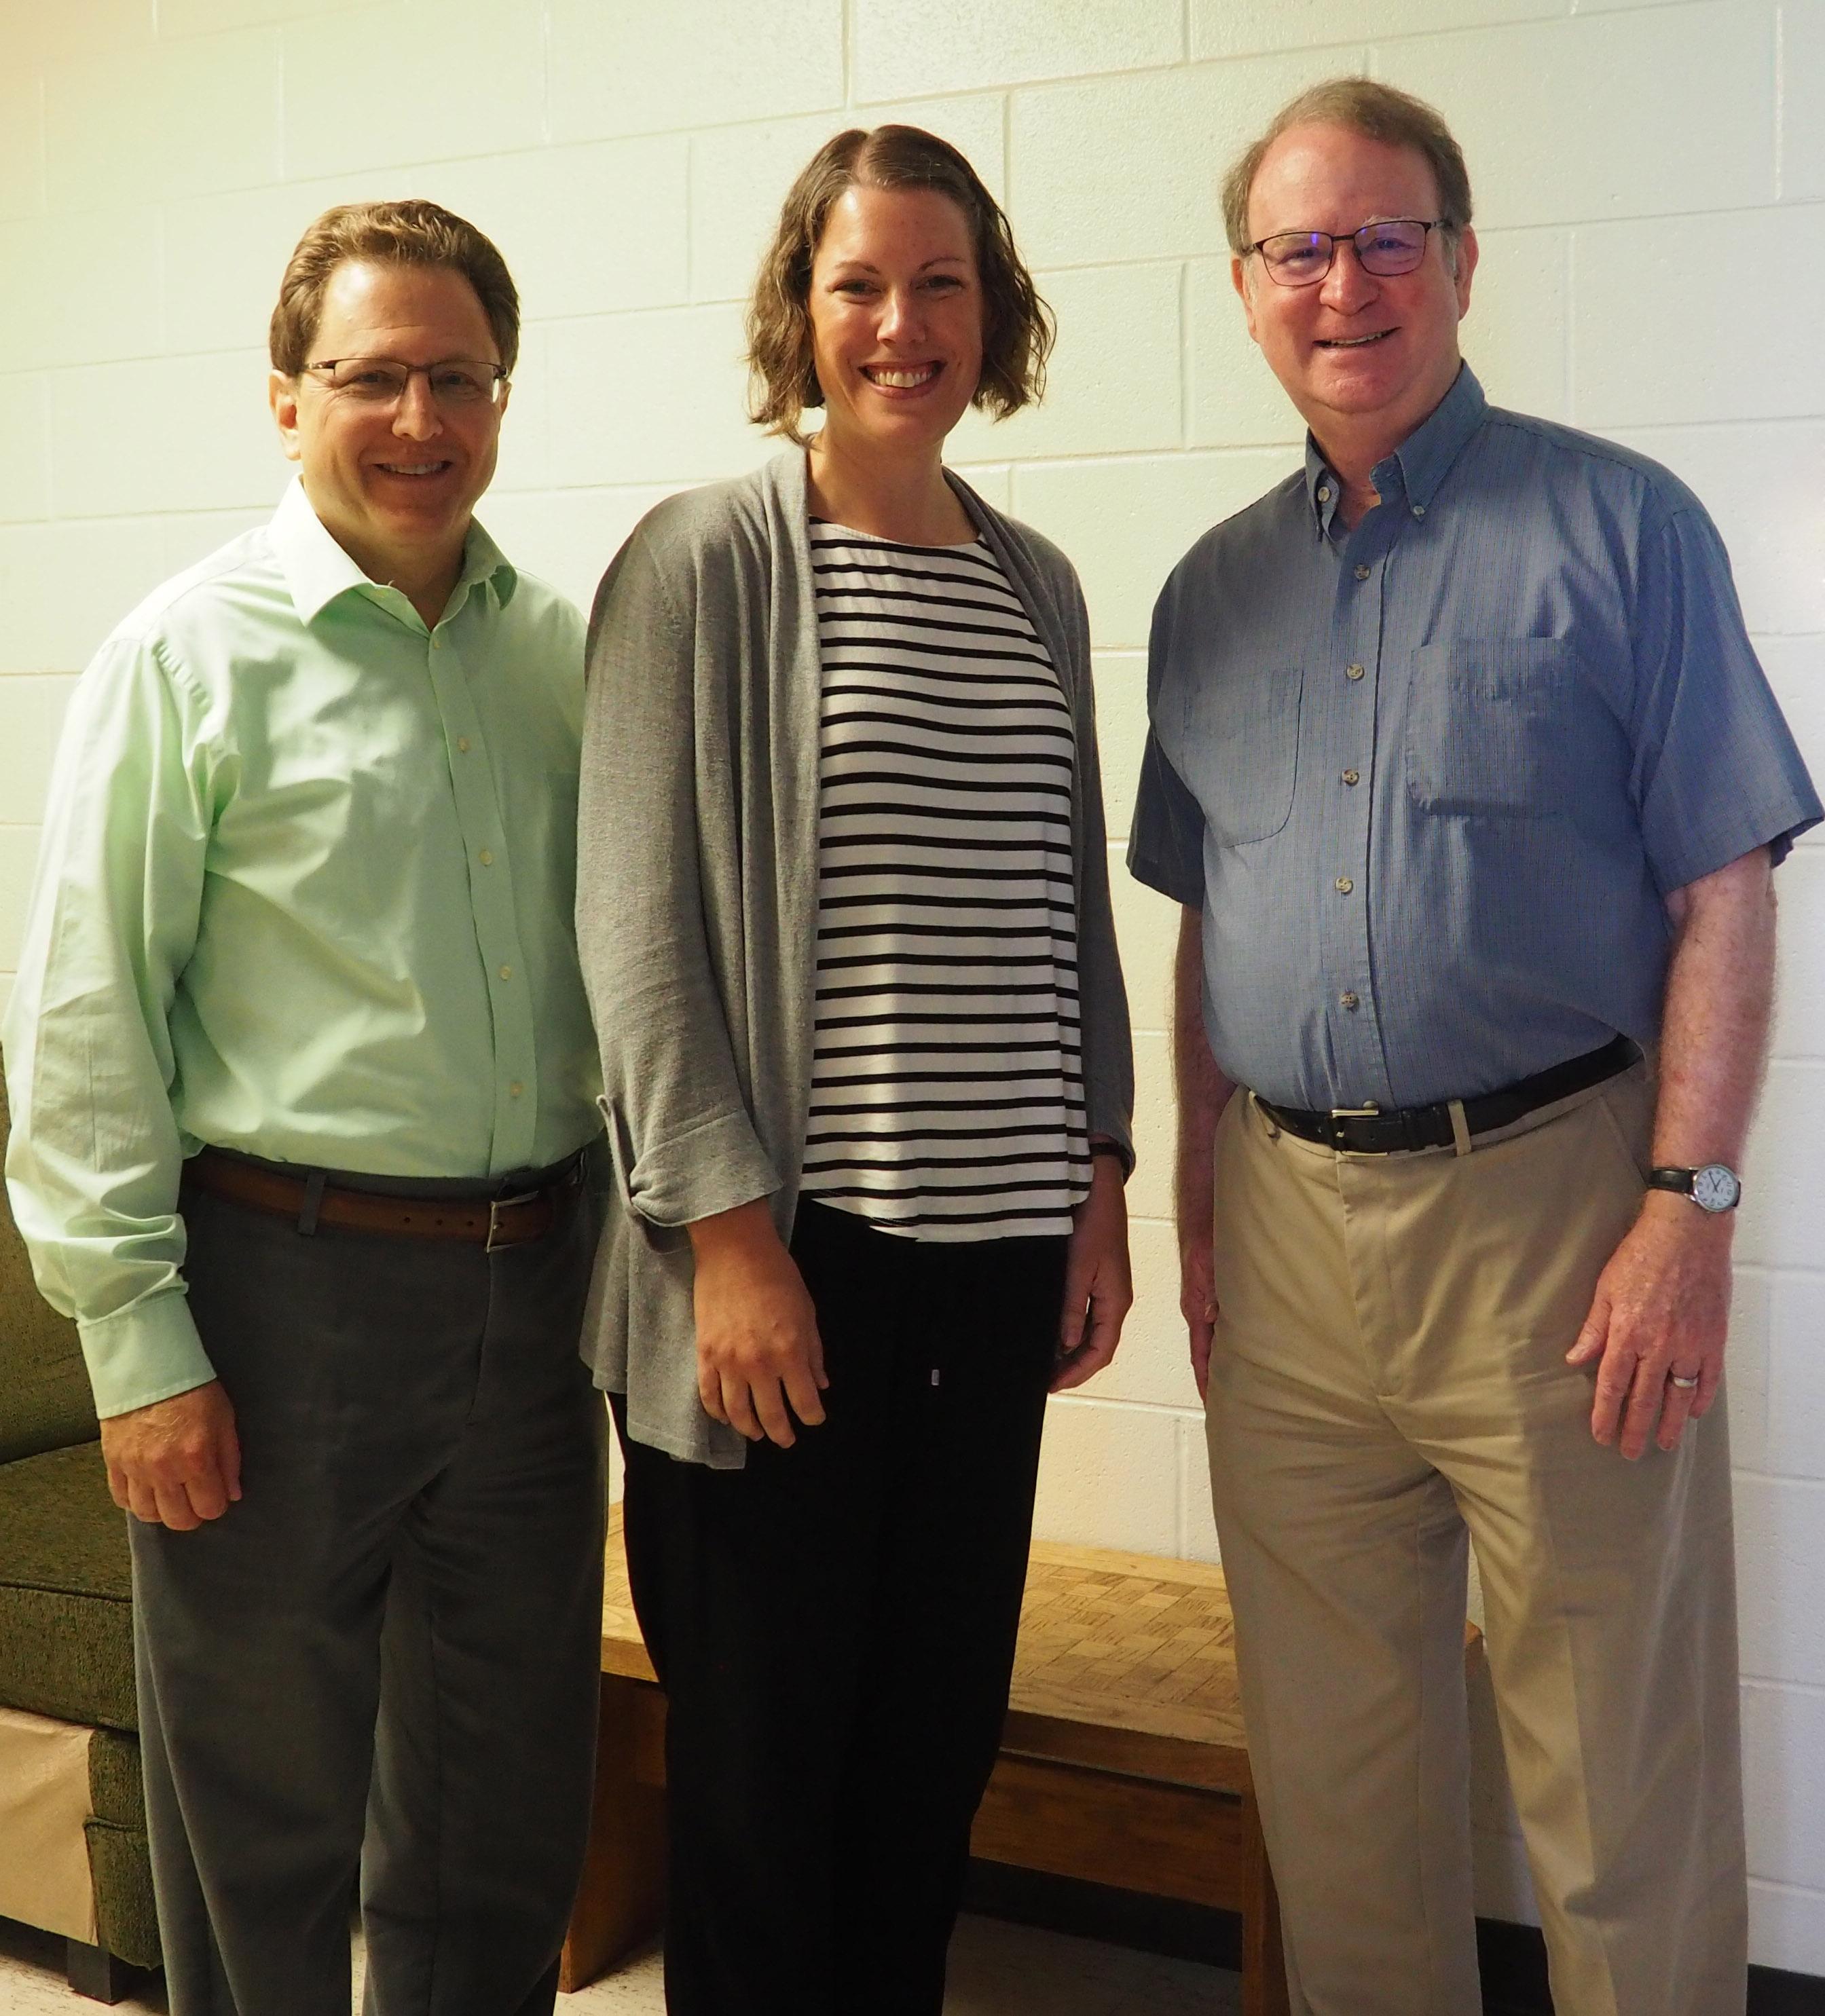 Arnold Weinfeld, Bethany Wilinski and Charles Ballard